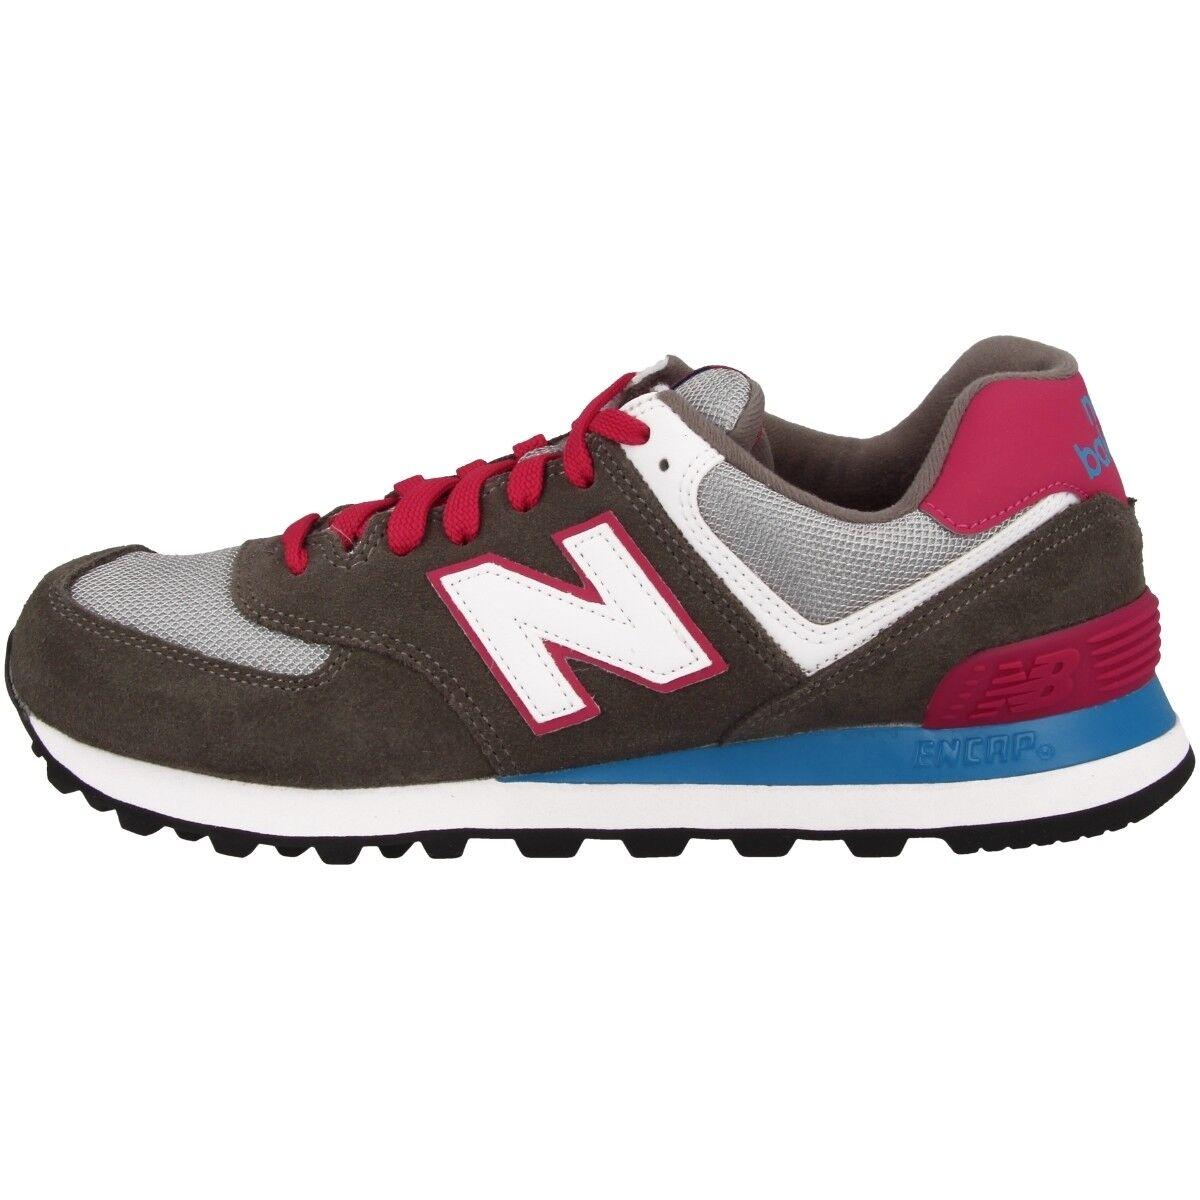 New Balance WL574 Cpw shoes women grey pink Turchese WL574CPW Sneaker Fucsia